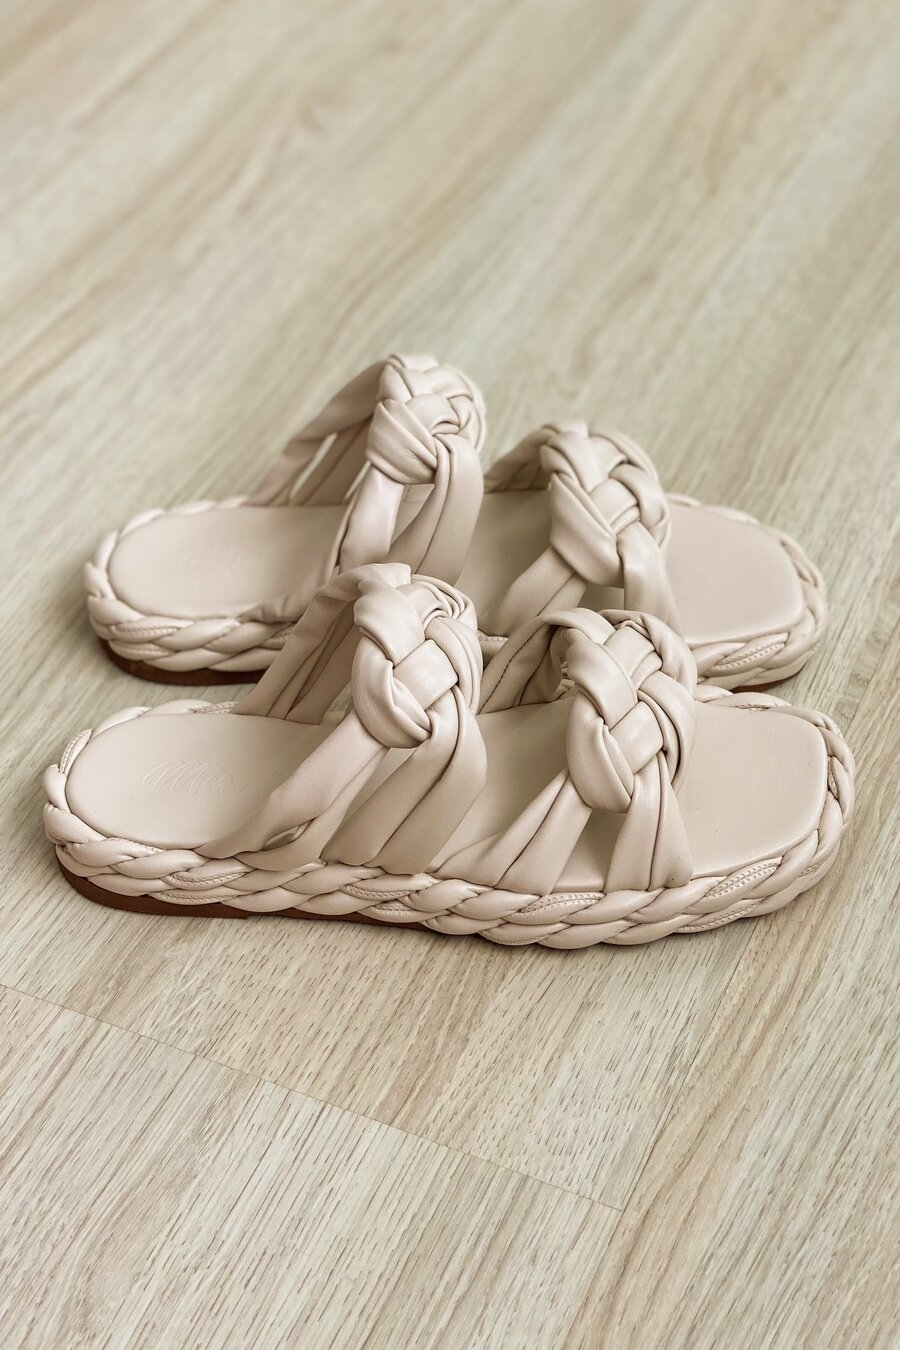 Flat Bia Porcelana